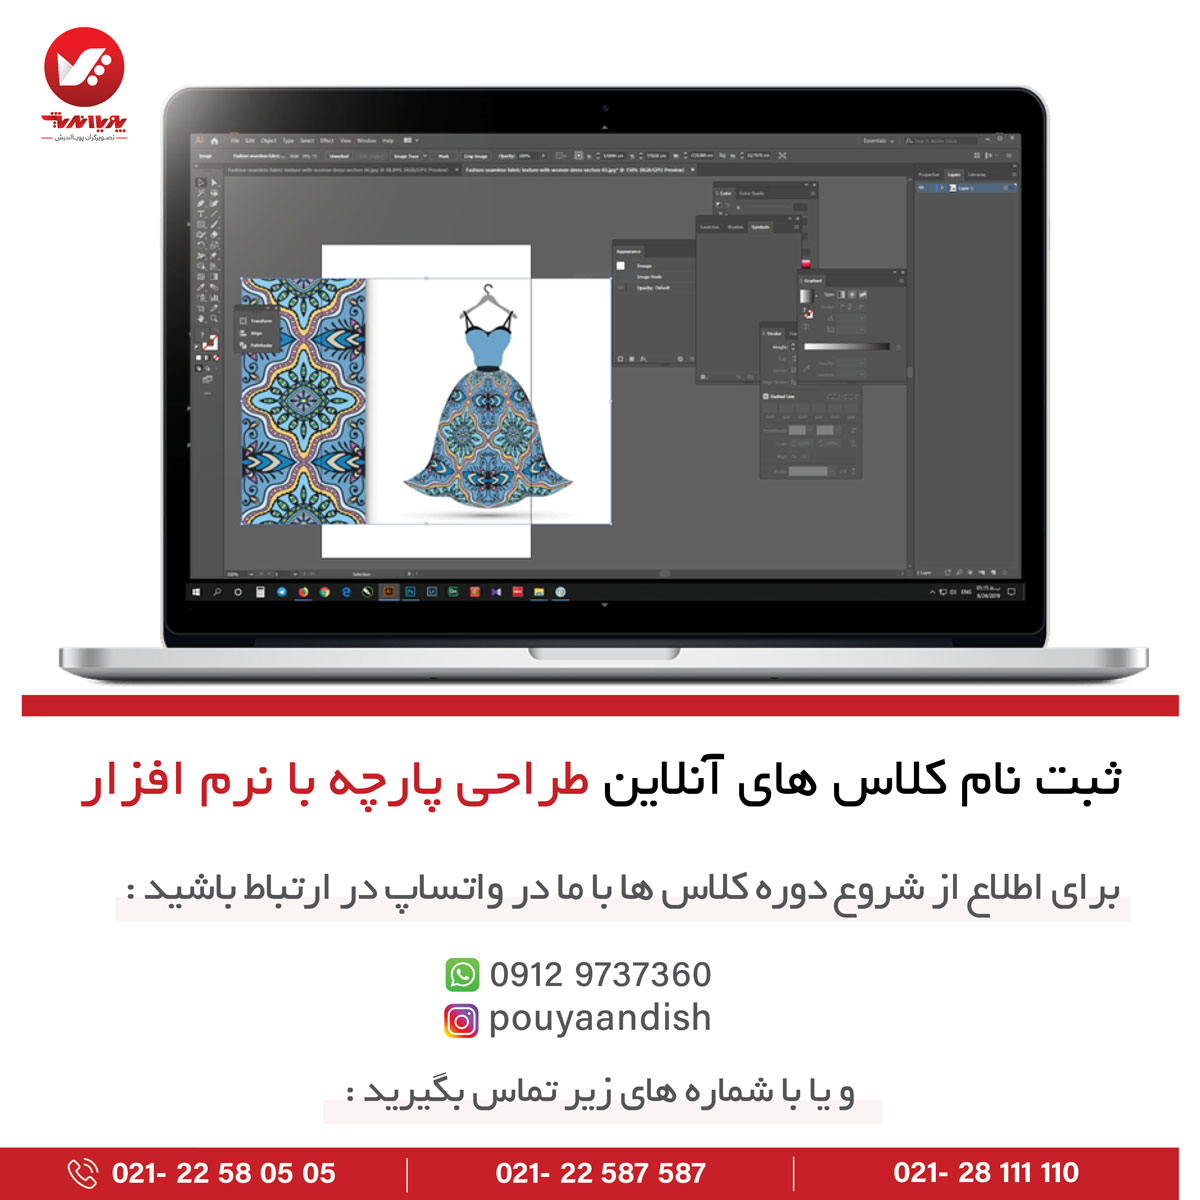 tarahi parche sabtenam - طراحی پارچه با نرم افزار